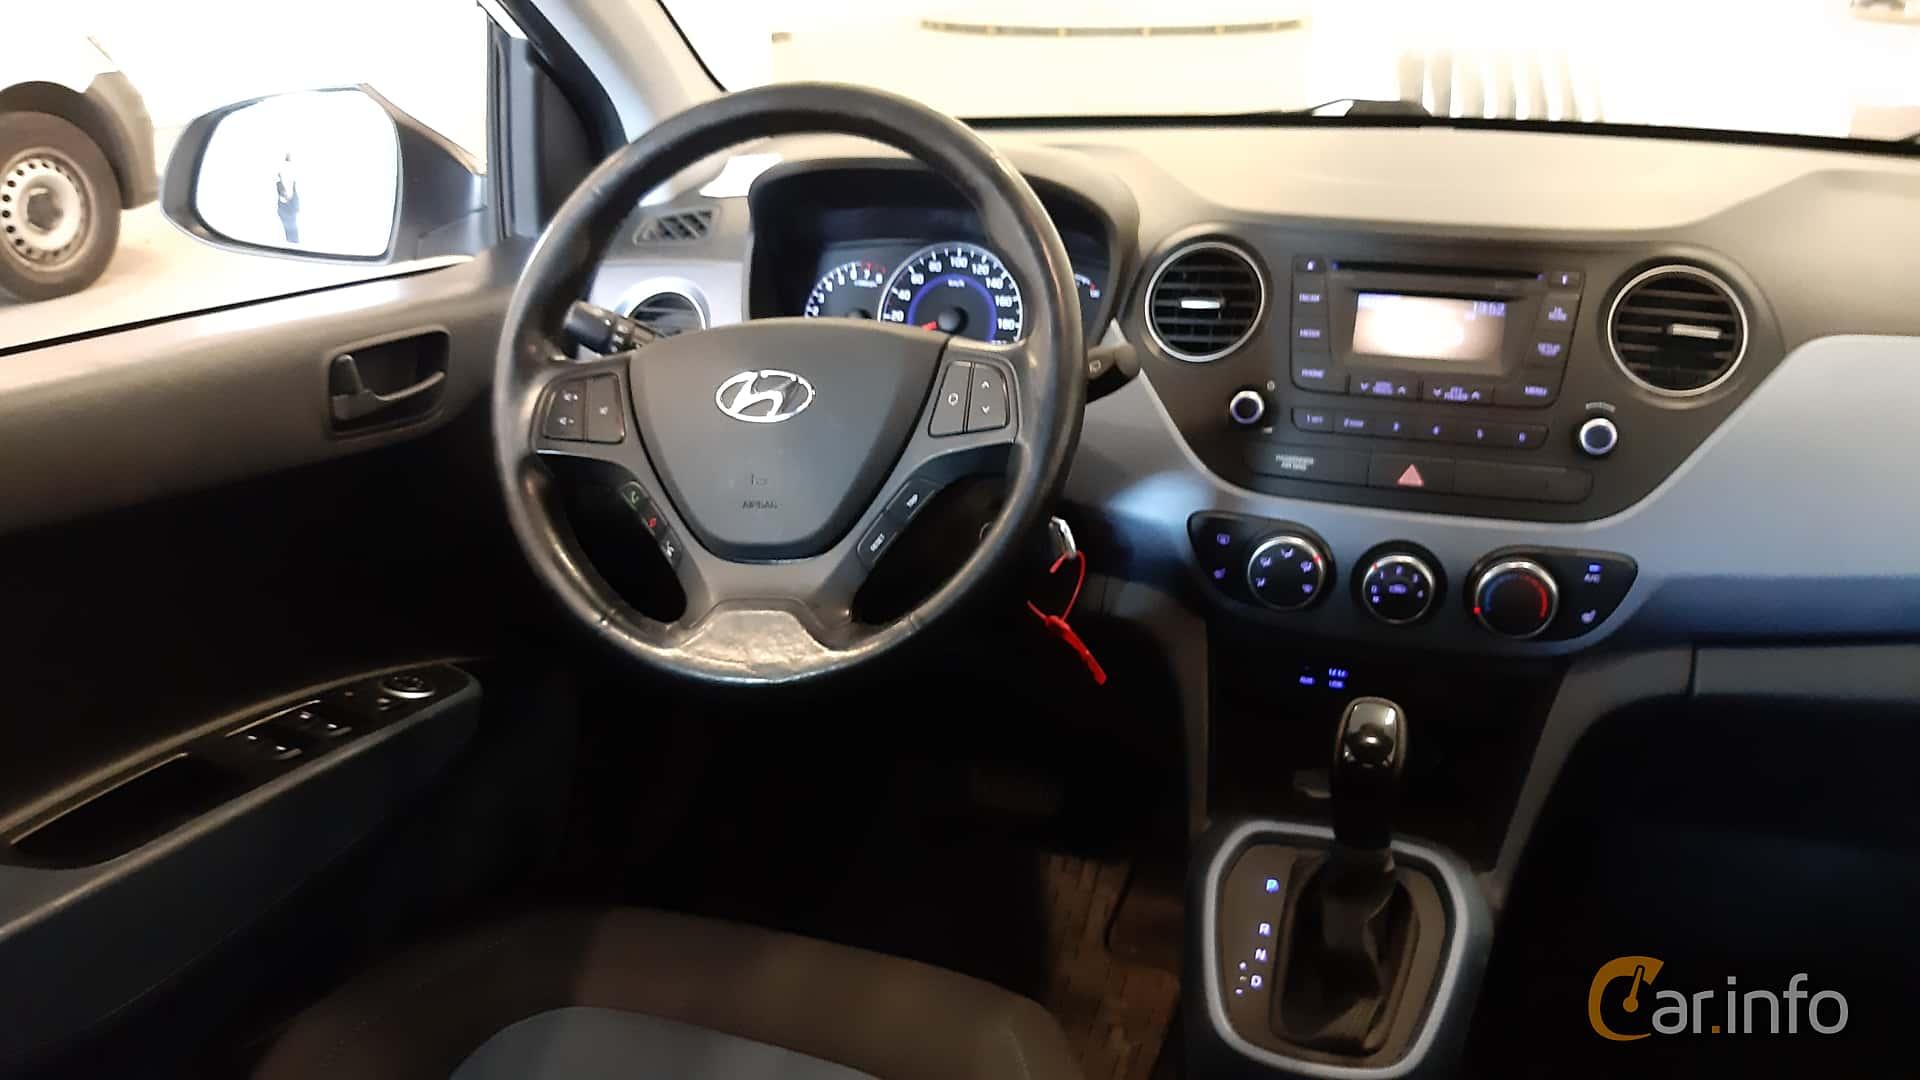 Hyundai i10 1.0 Automatic, 67hp, 2016